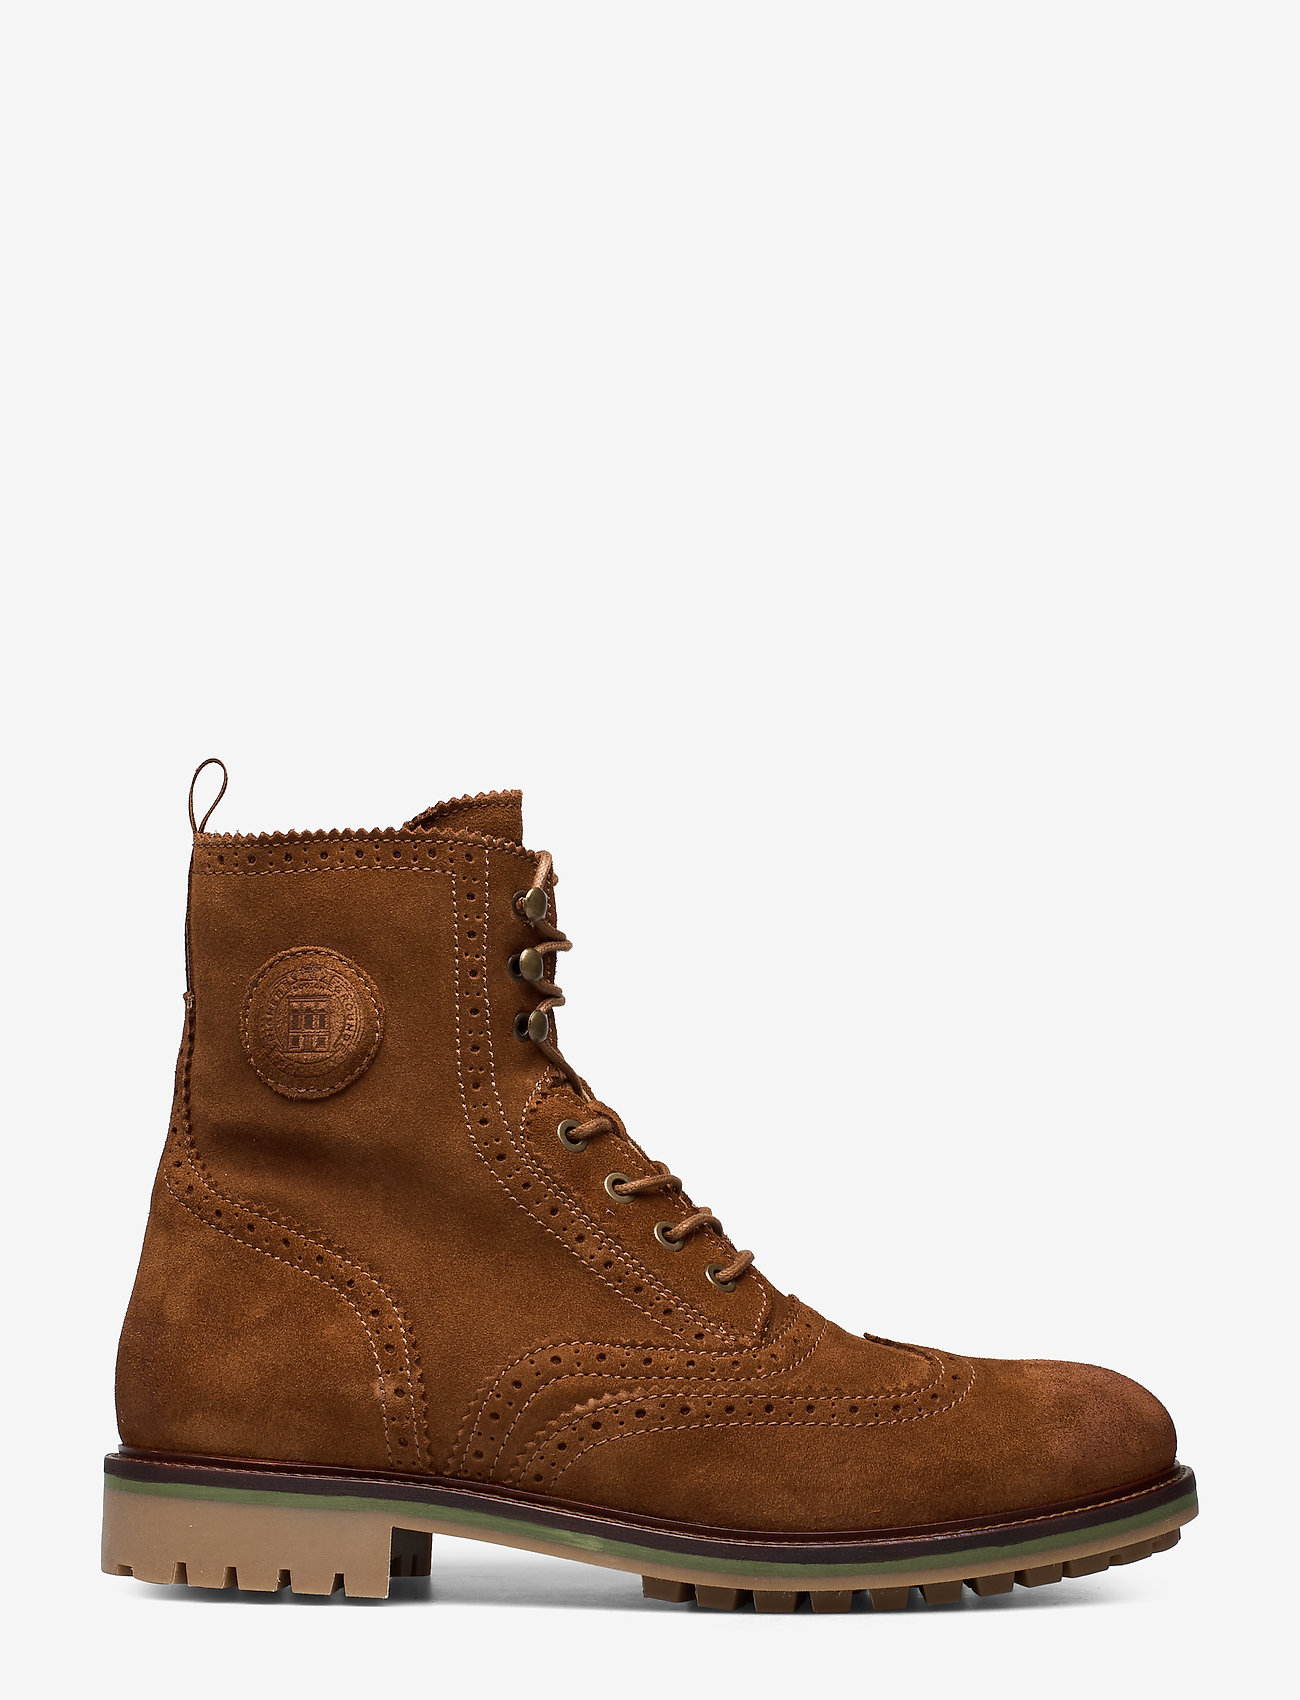 Scotch & Soda Shoes - Borrel Mid laceboot - laced boots - cognac - 1